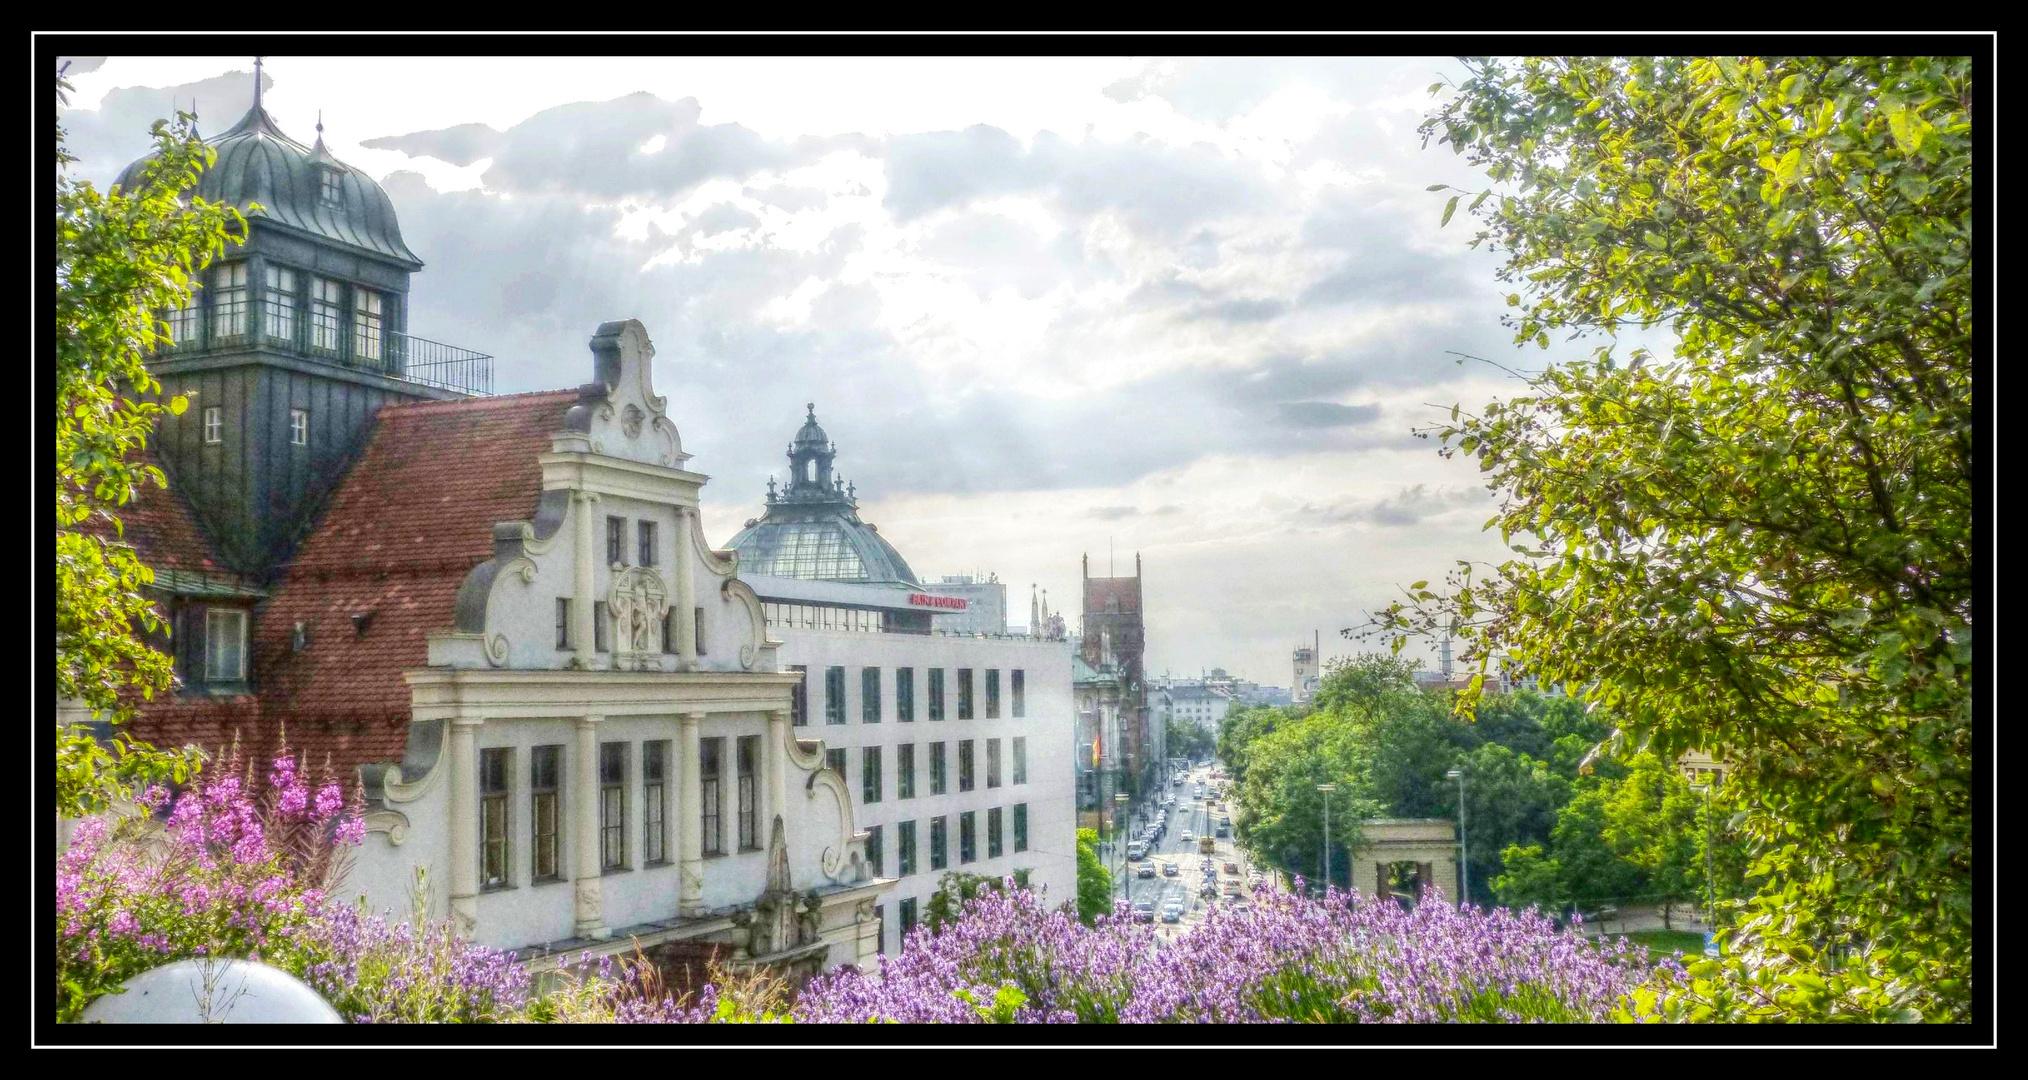 buena vista (2) - München - Lenbachplatz